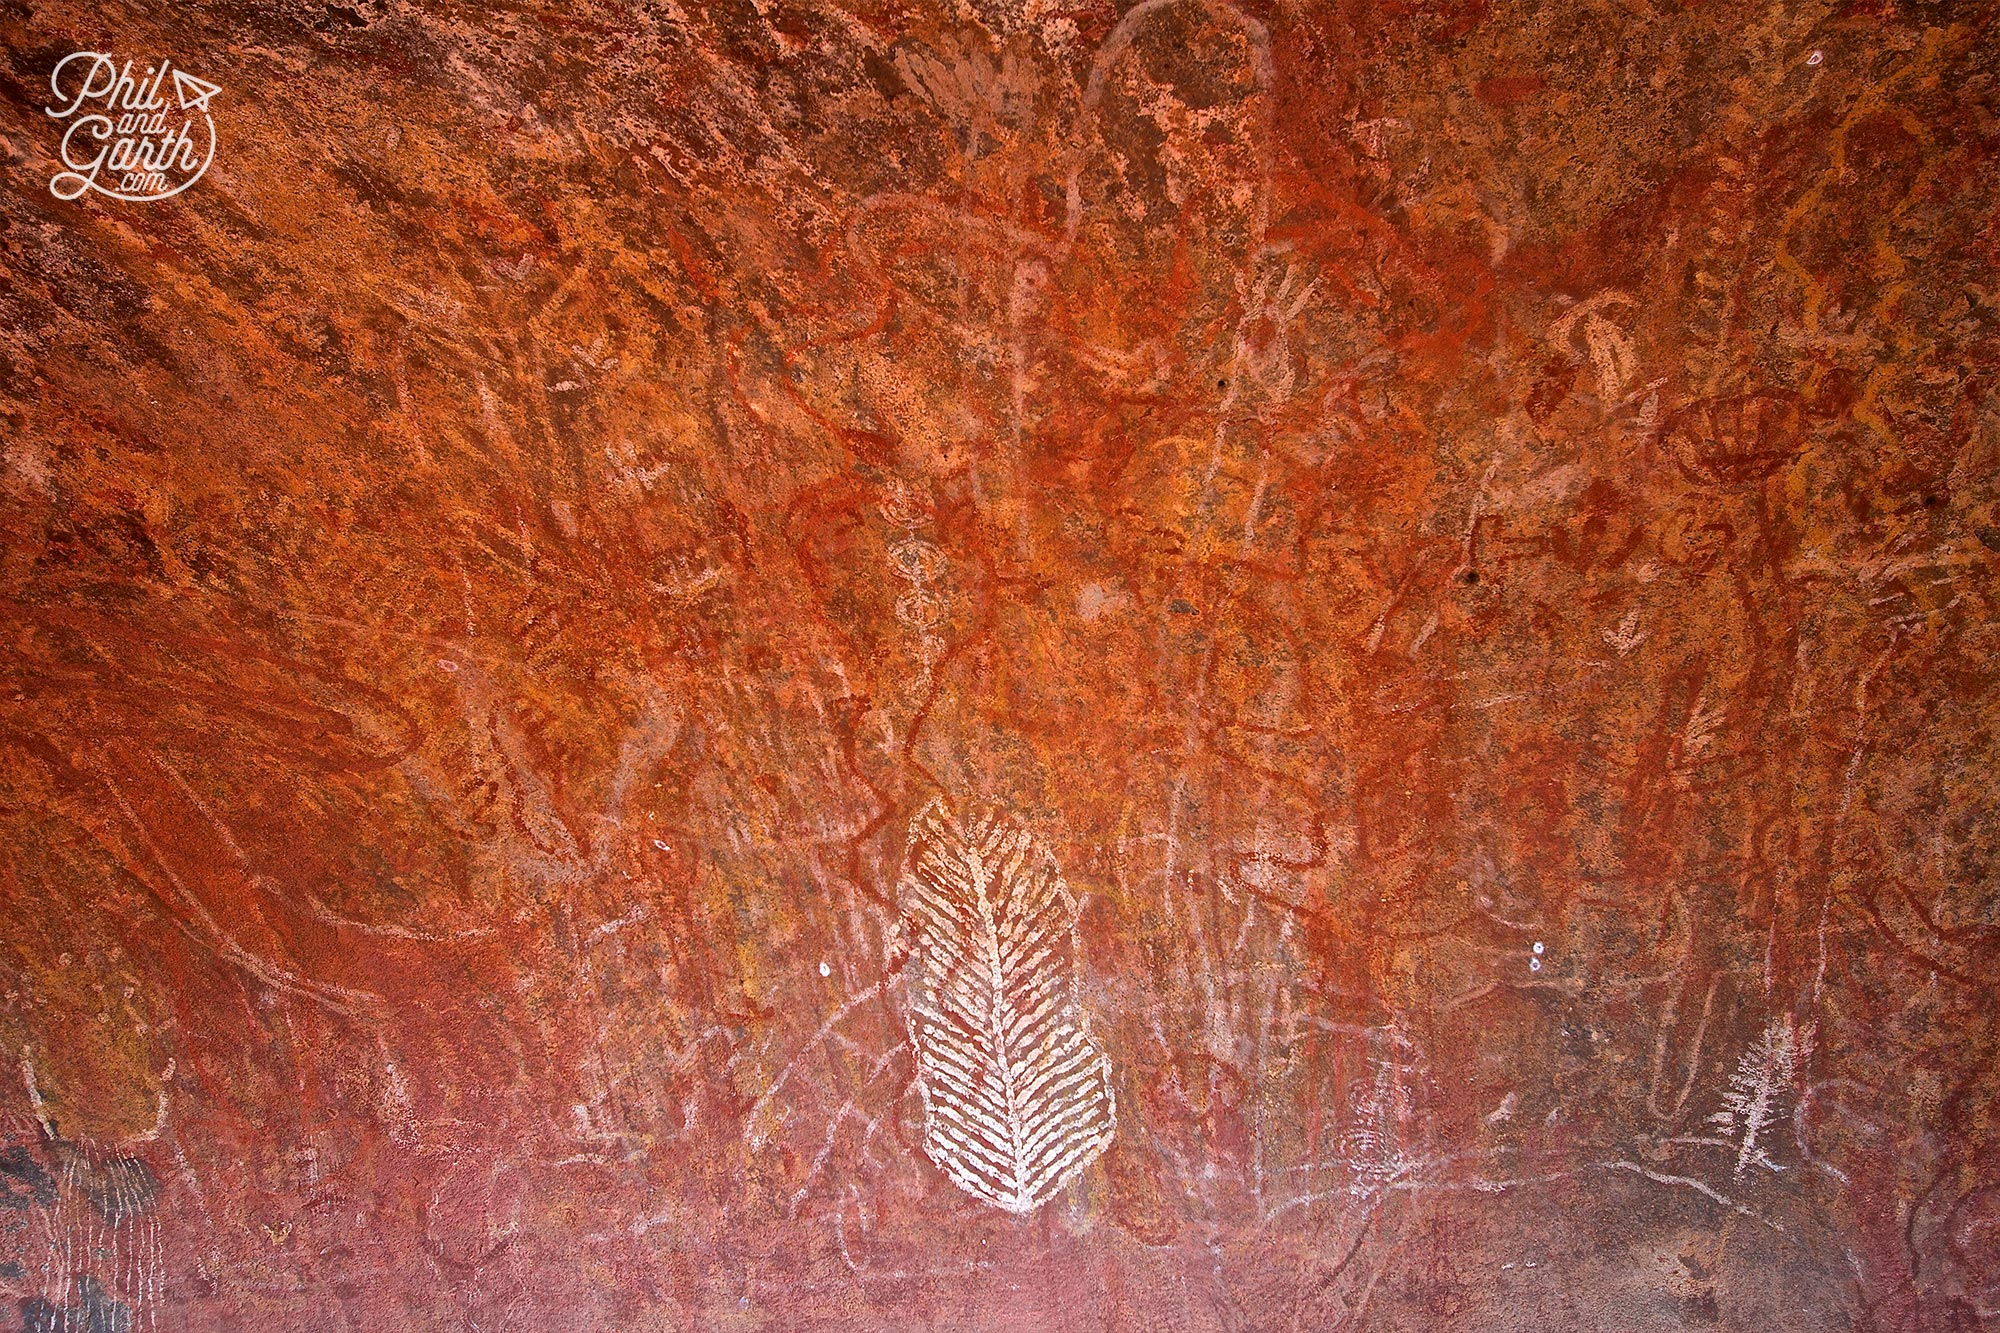 Ancient Aboriginal cave paintings Uluru